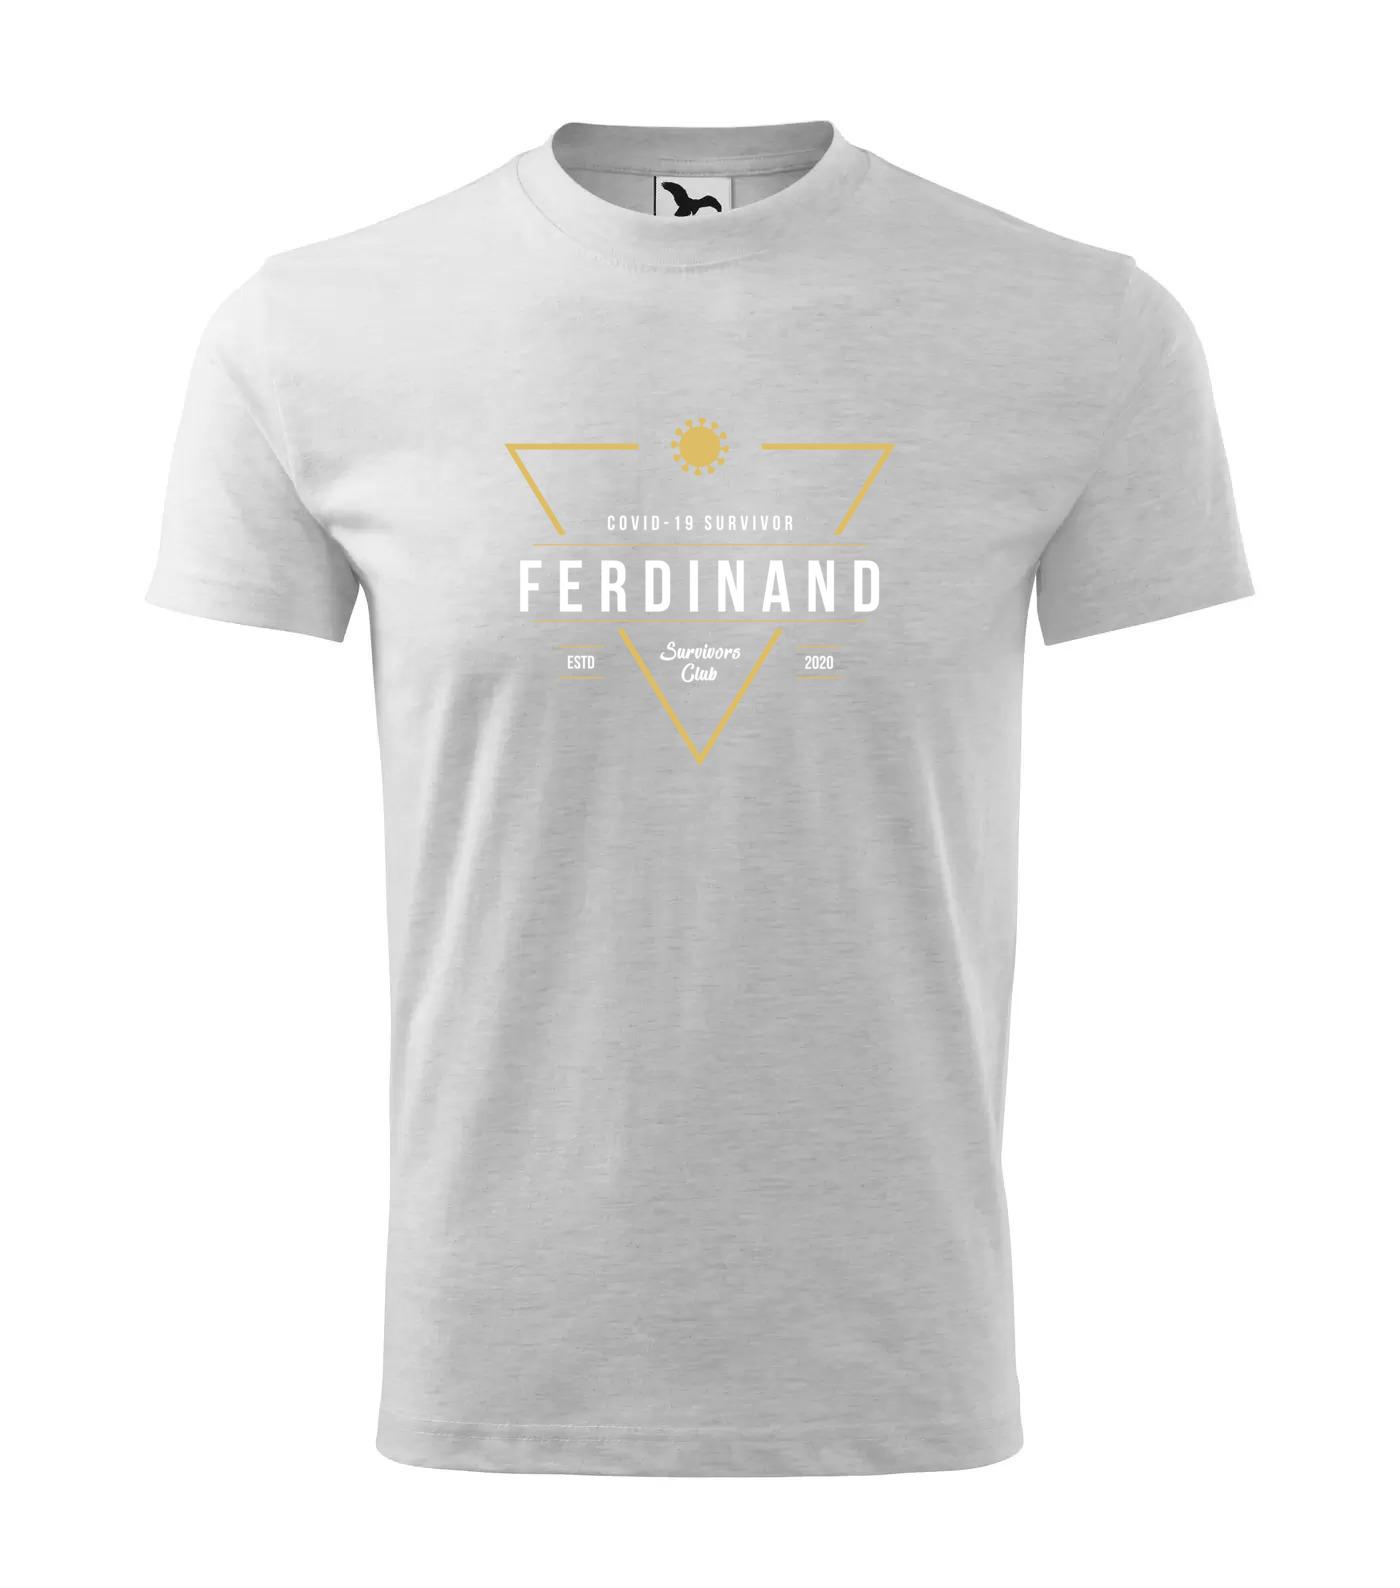 Tričko Survivor Club Ferdinand